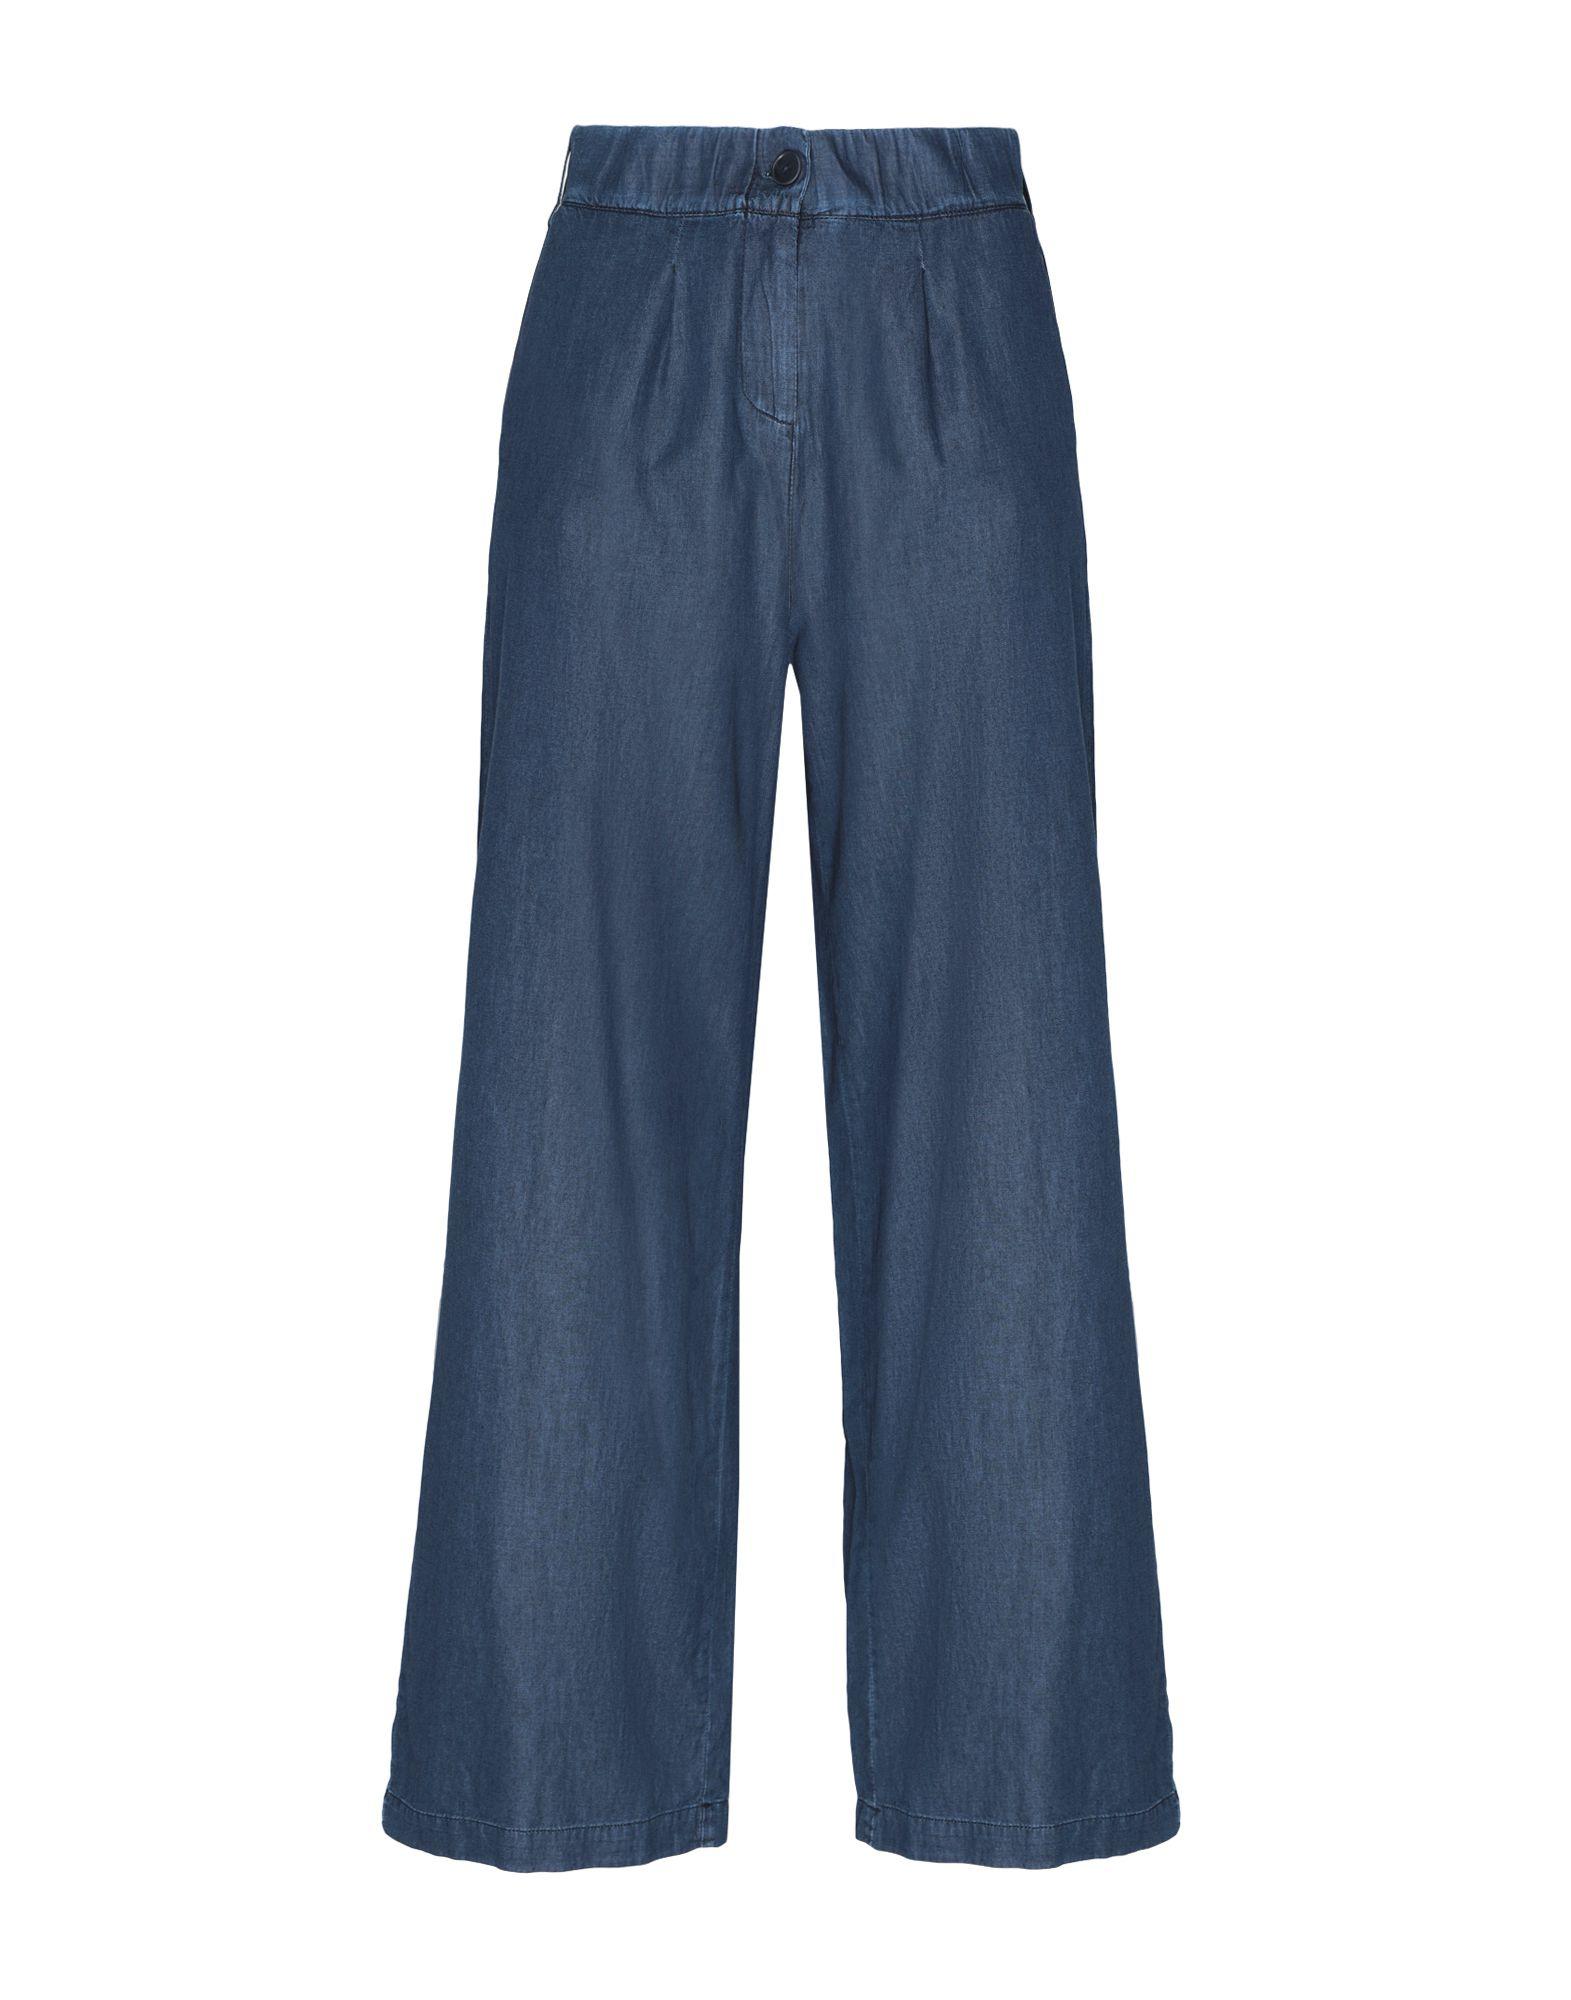 8 by YOOX Джинсовые брюки брюки 7 8 quelle b c best connections by heine 154161